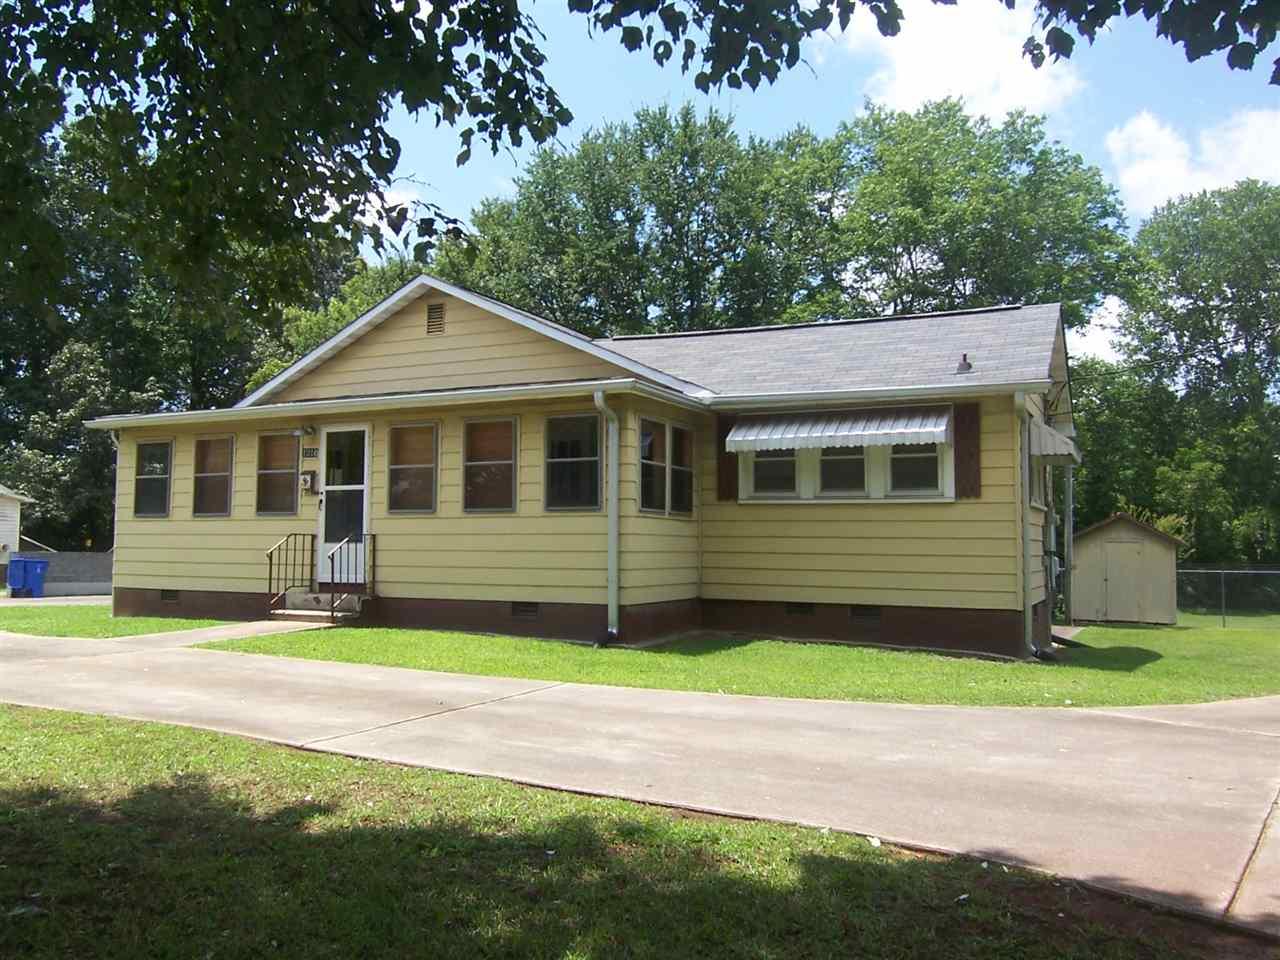 1310 S Dekalb Street, Shelby, NC 28152